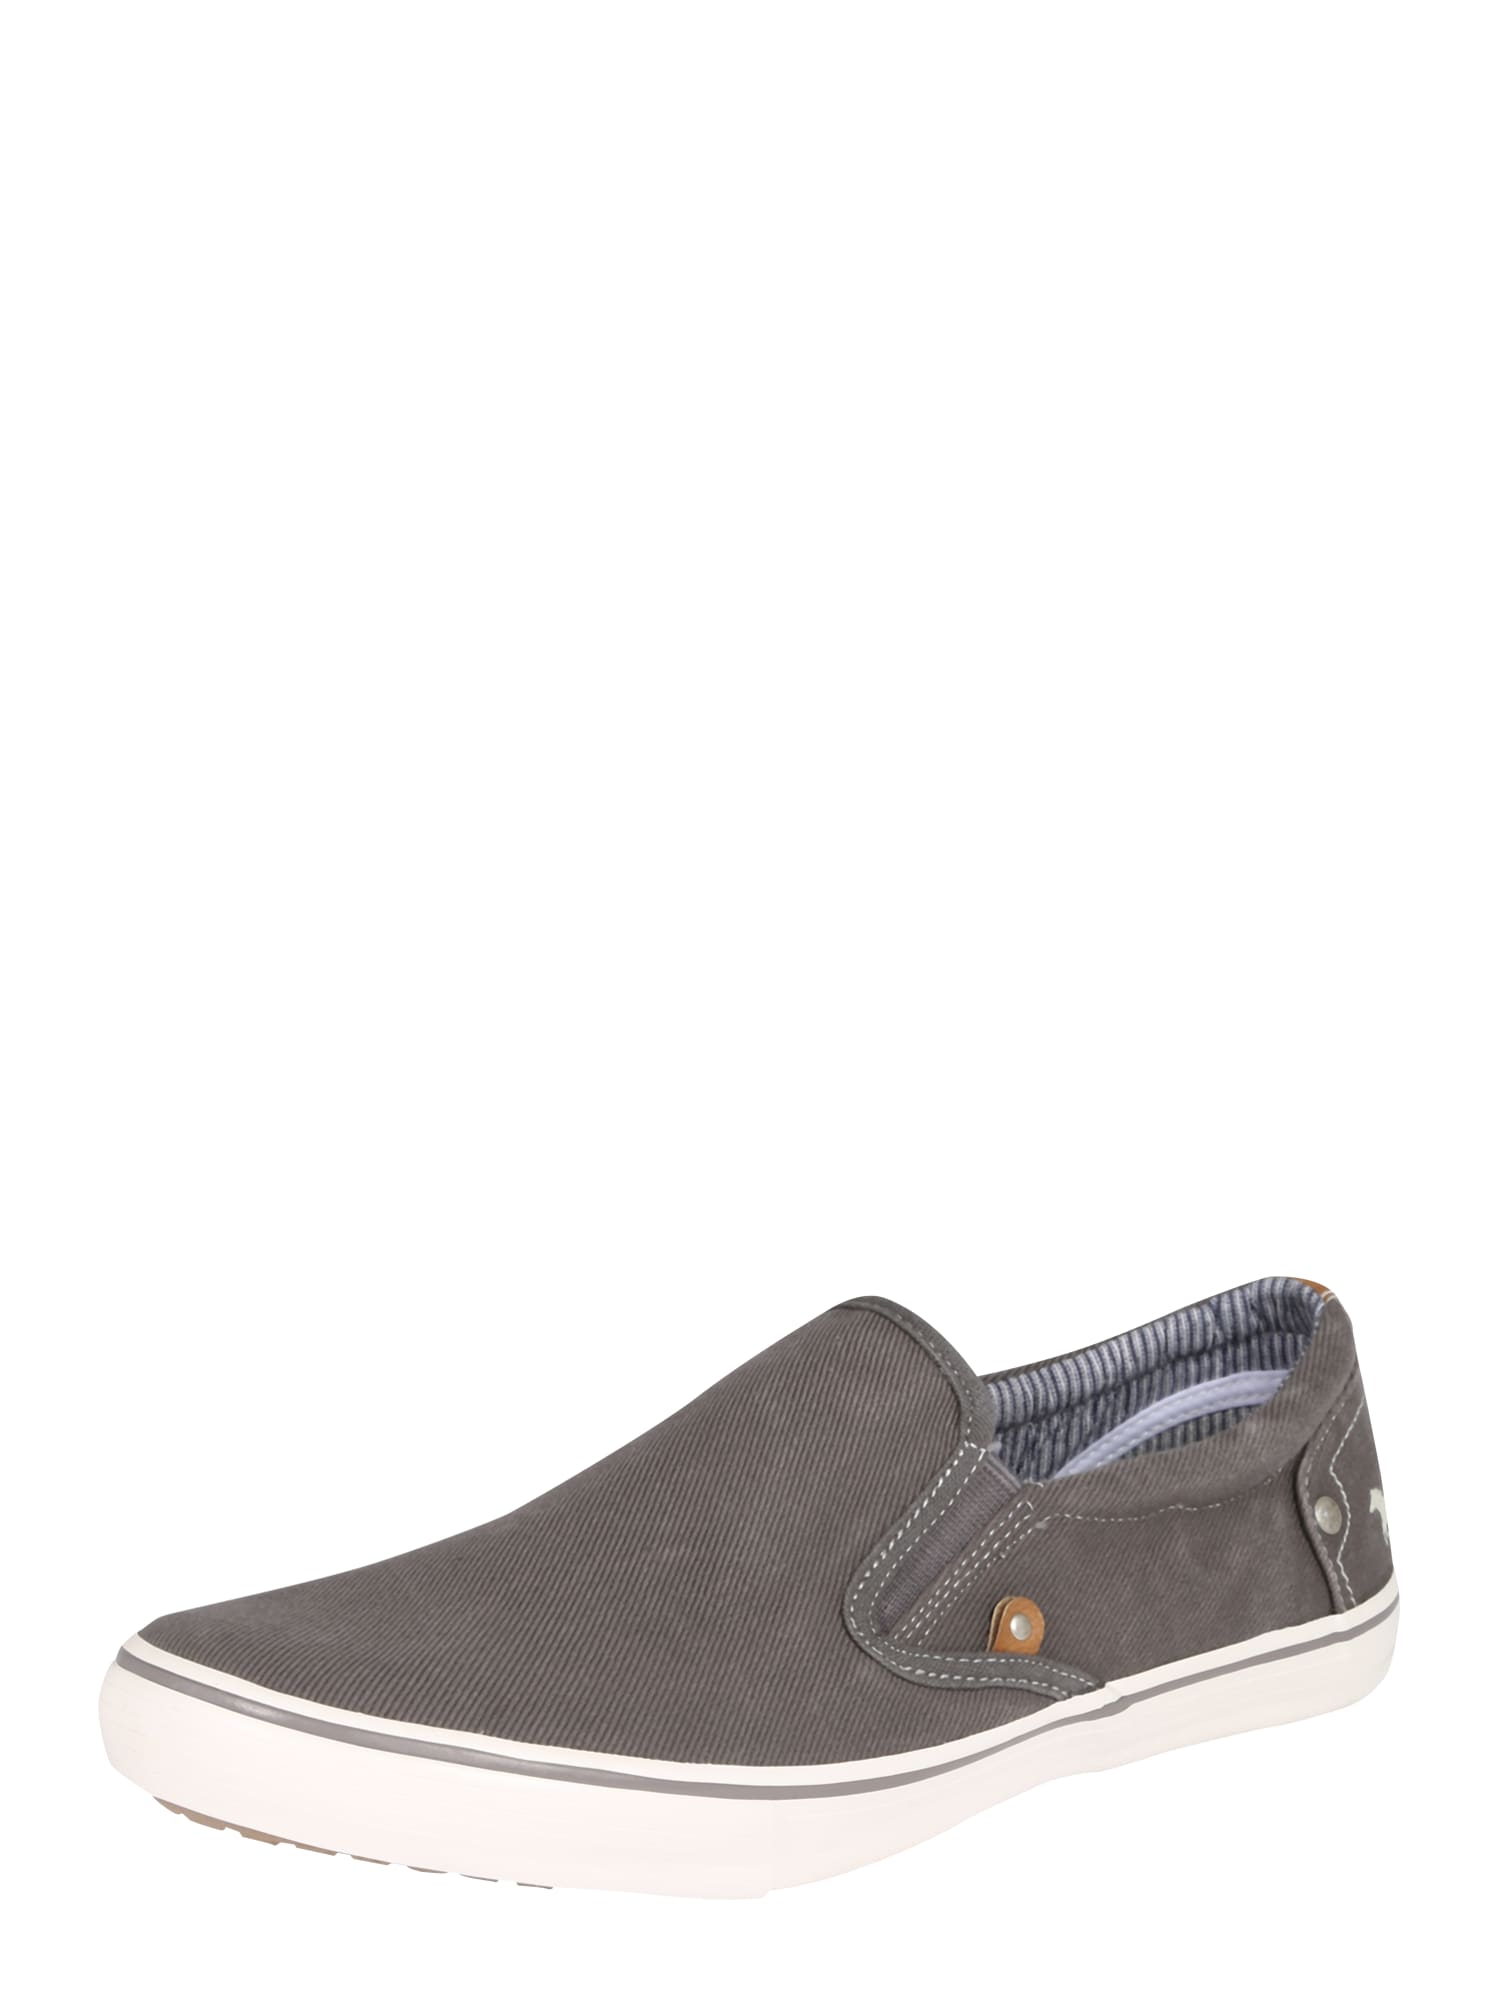 Slip on boty tmavě šedá MUSTANG